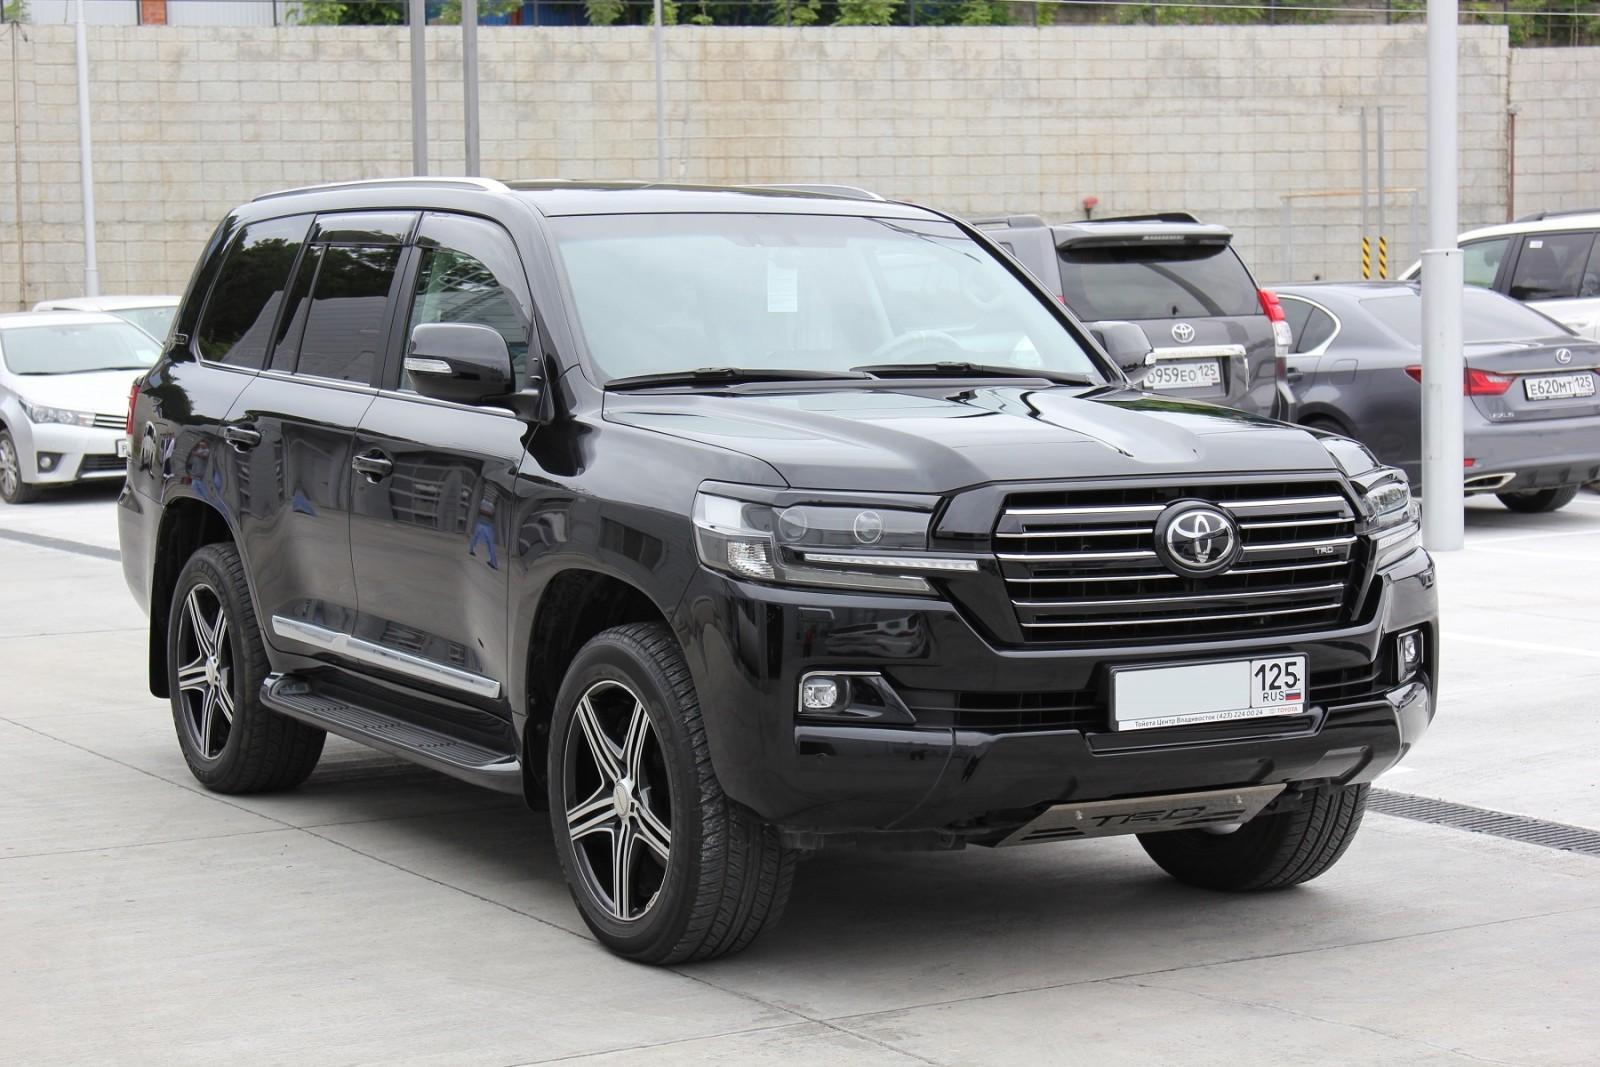 Рестайлинг Toyota Land Cruiser 200 2020 - КОЛЕСА.ру ... | 1067x1600